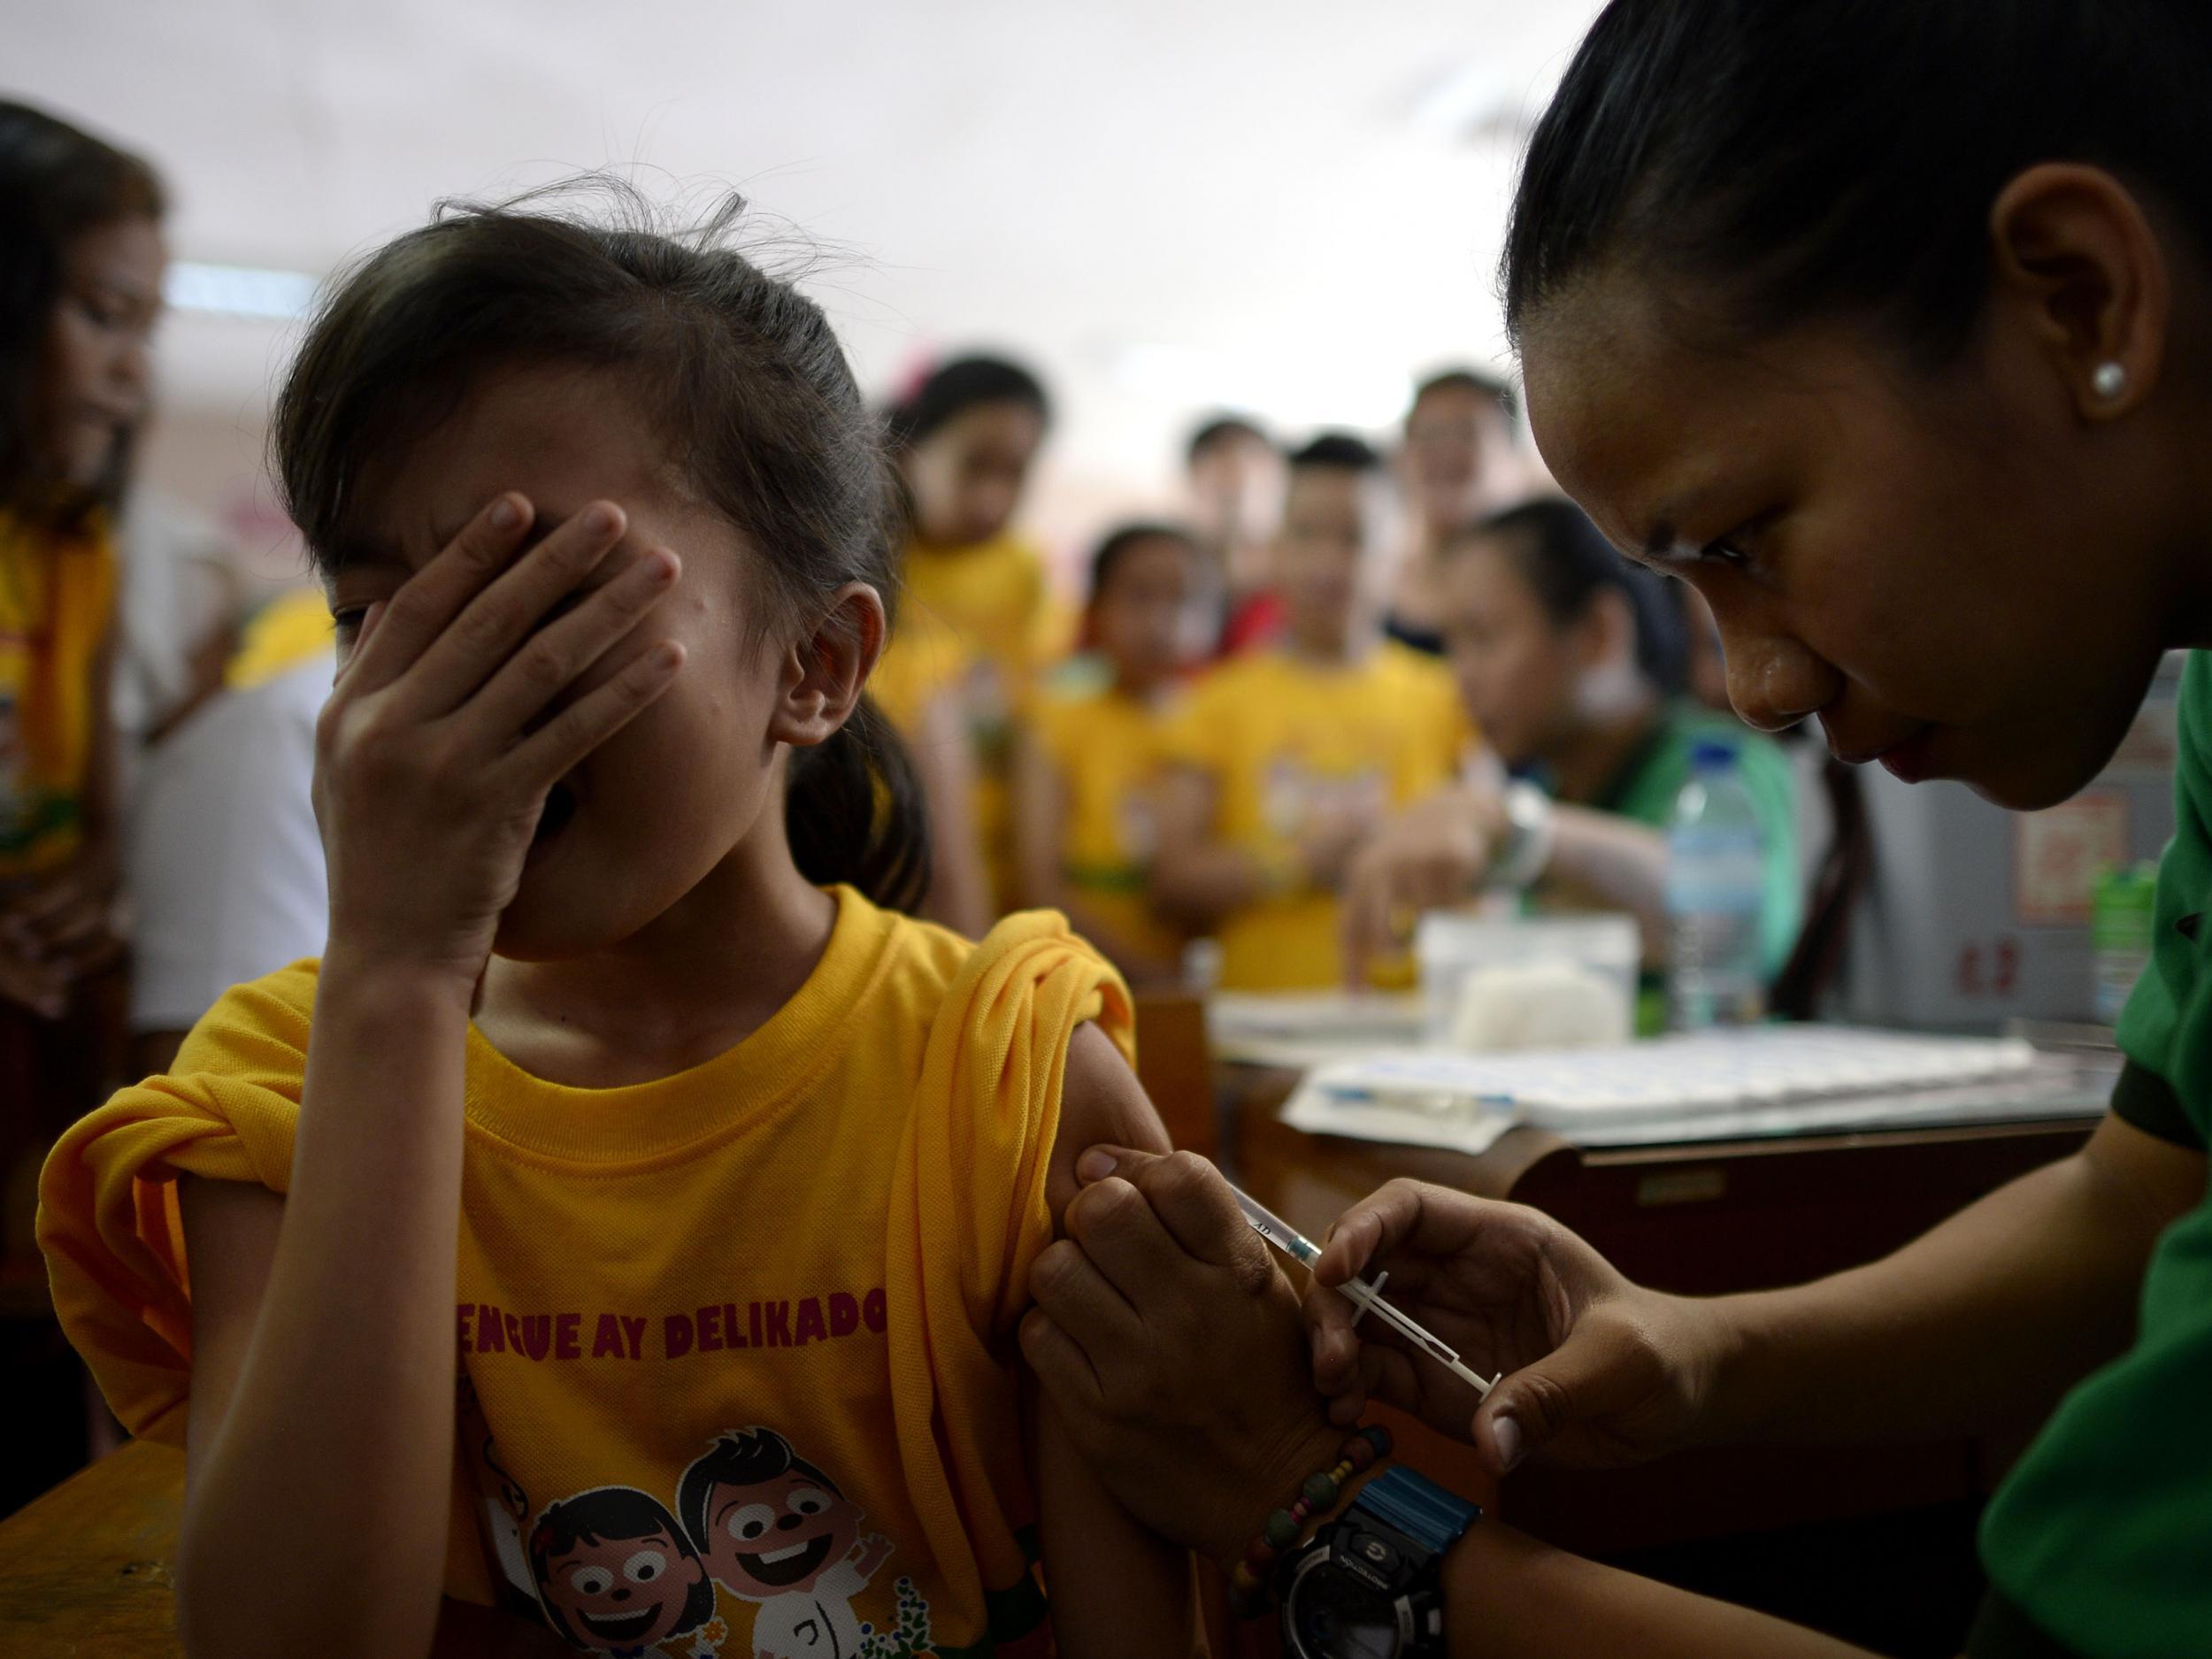 Philippines prepared for 'worst-case scenario' after 733,000